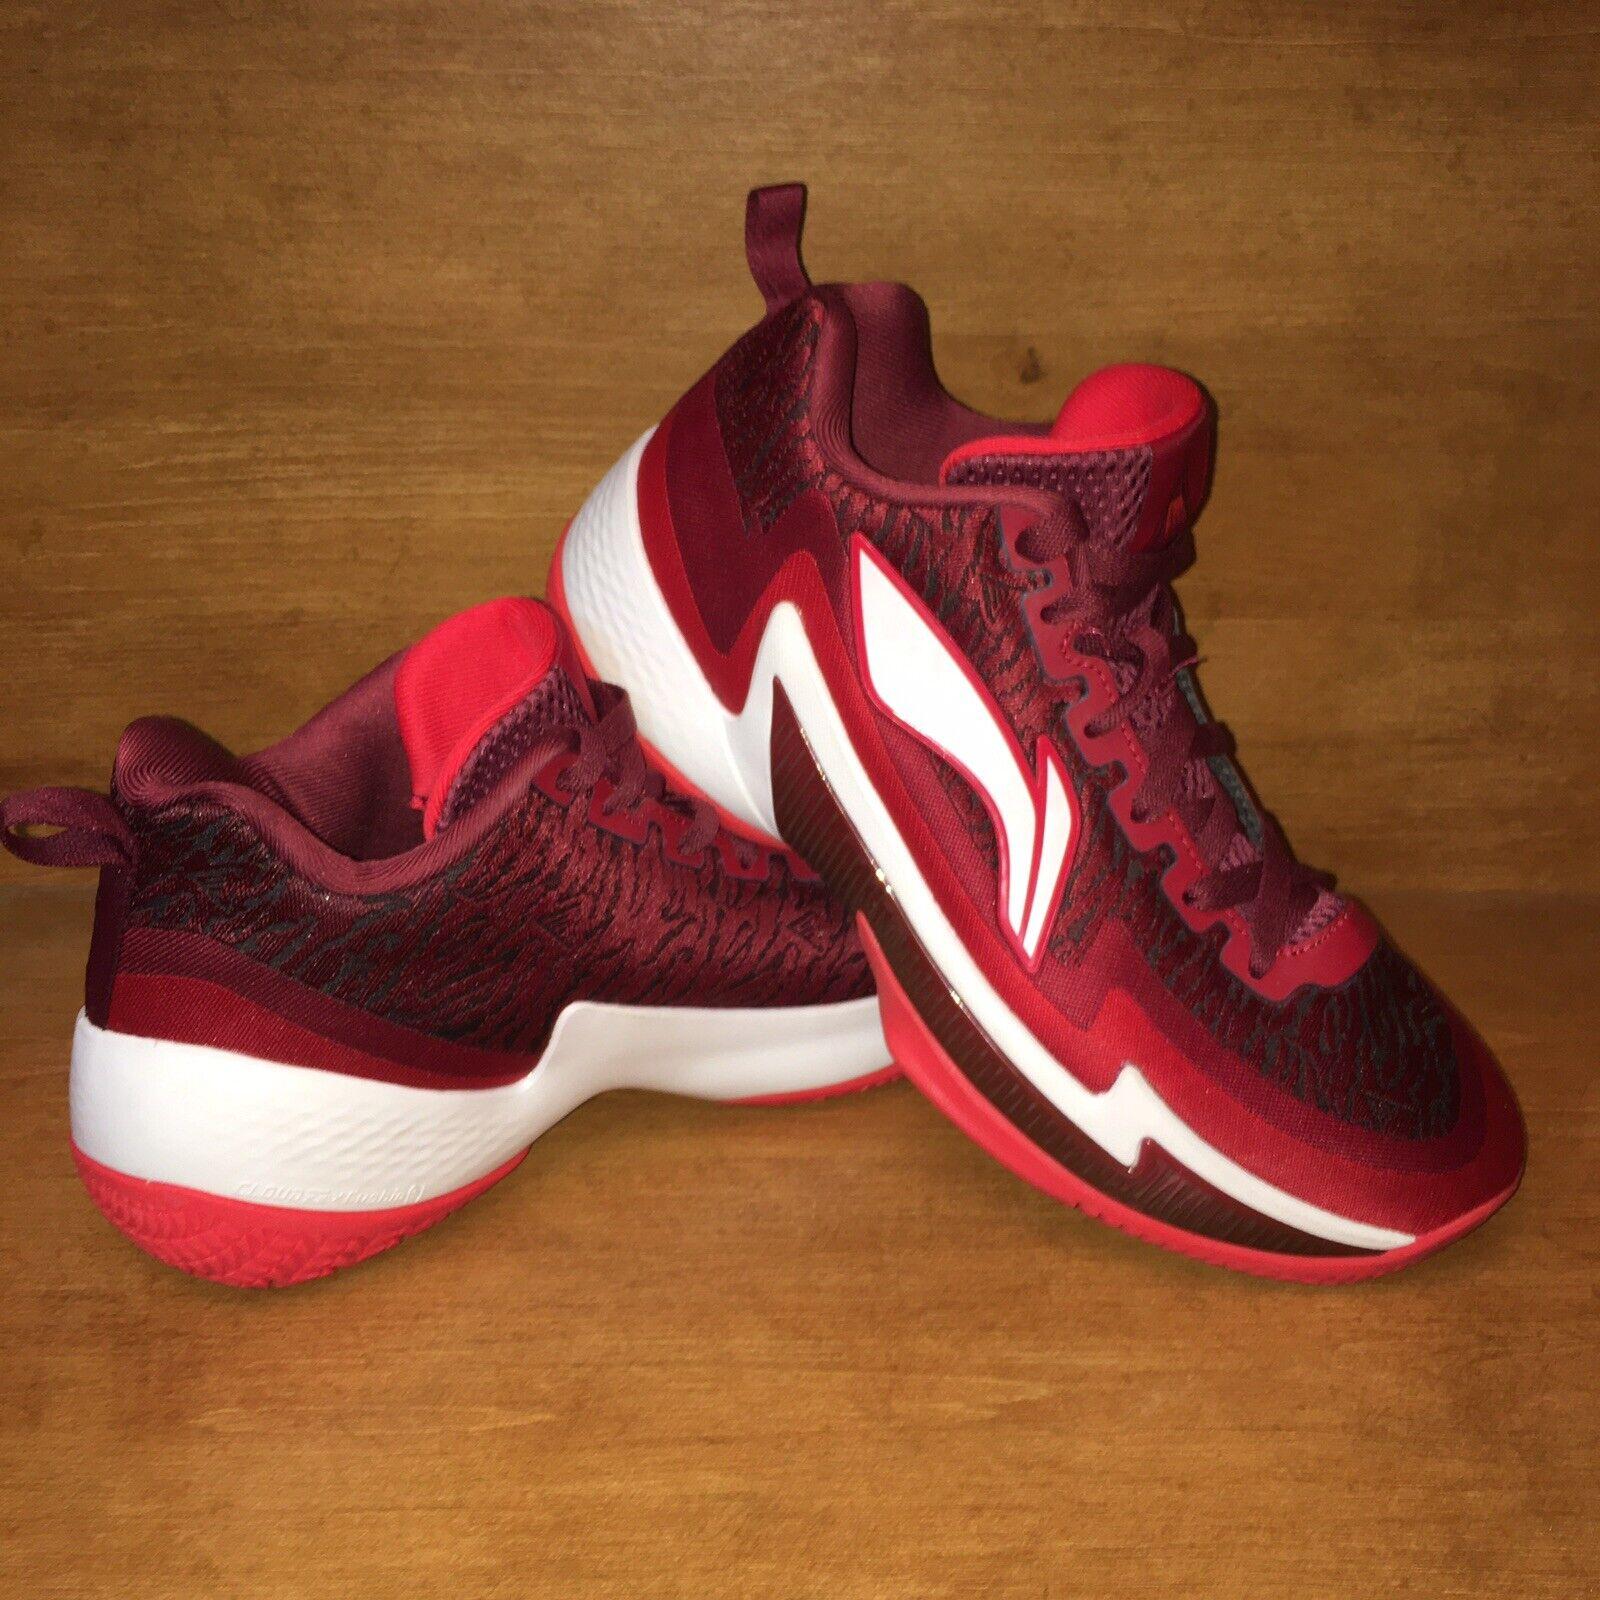 Li-Ning CBA NBA Basketball Shoes Red Power Cloud Cushion Mid Men's Size 8 Rare